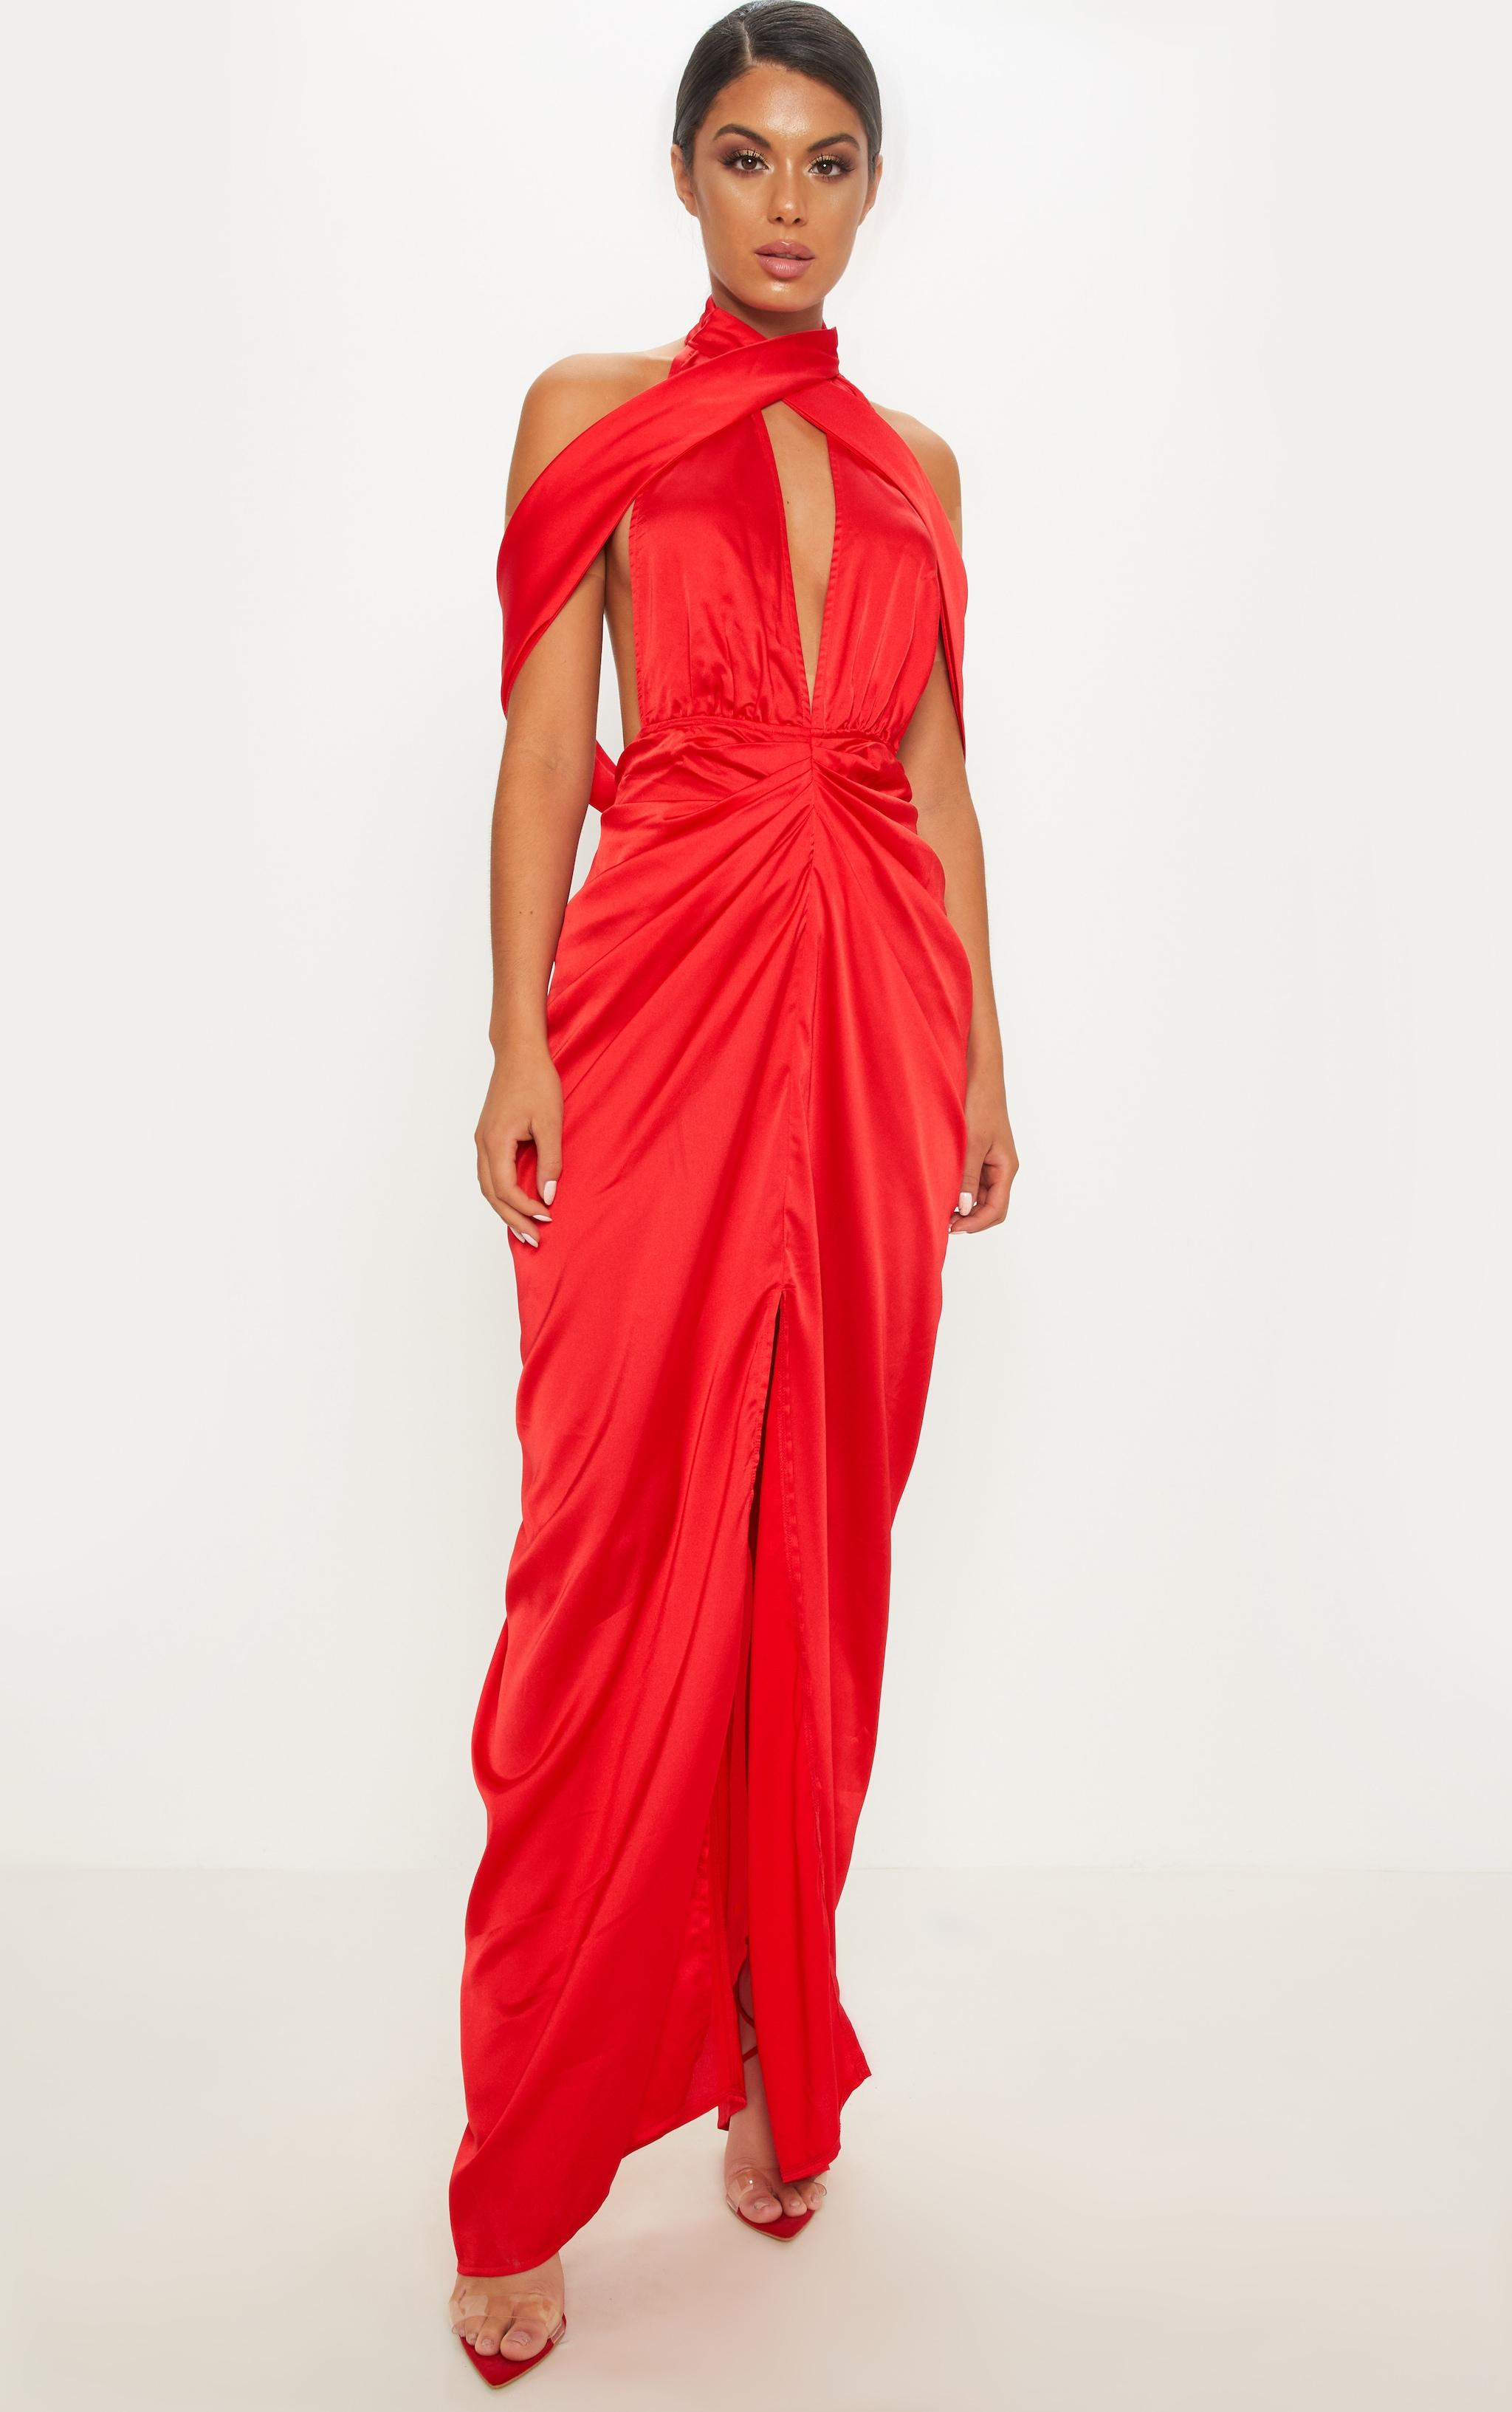 Red Satin Drape Detail Maxi Dress 1